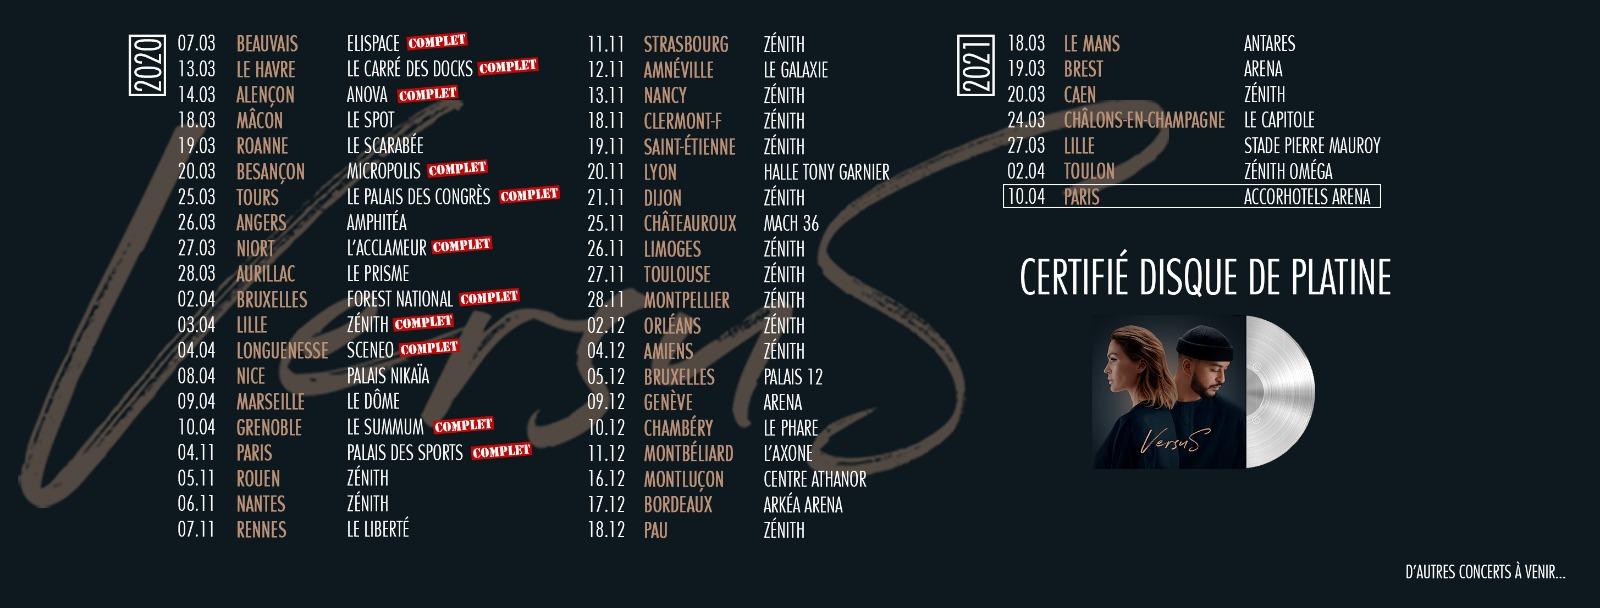 Vitaa Slimane - Versus Tour - tournée - concert